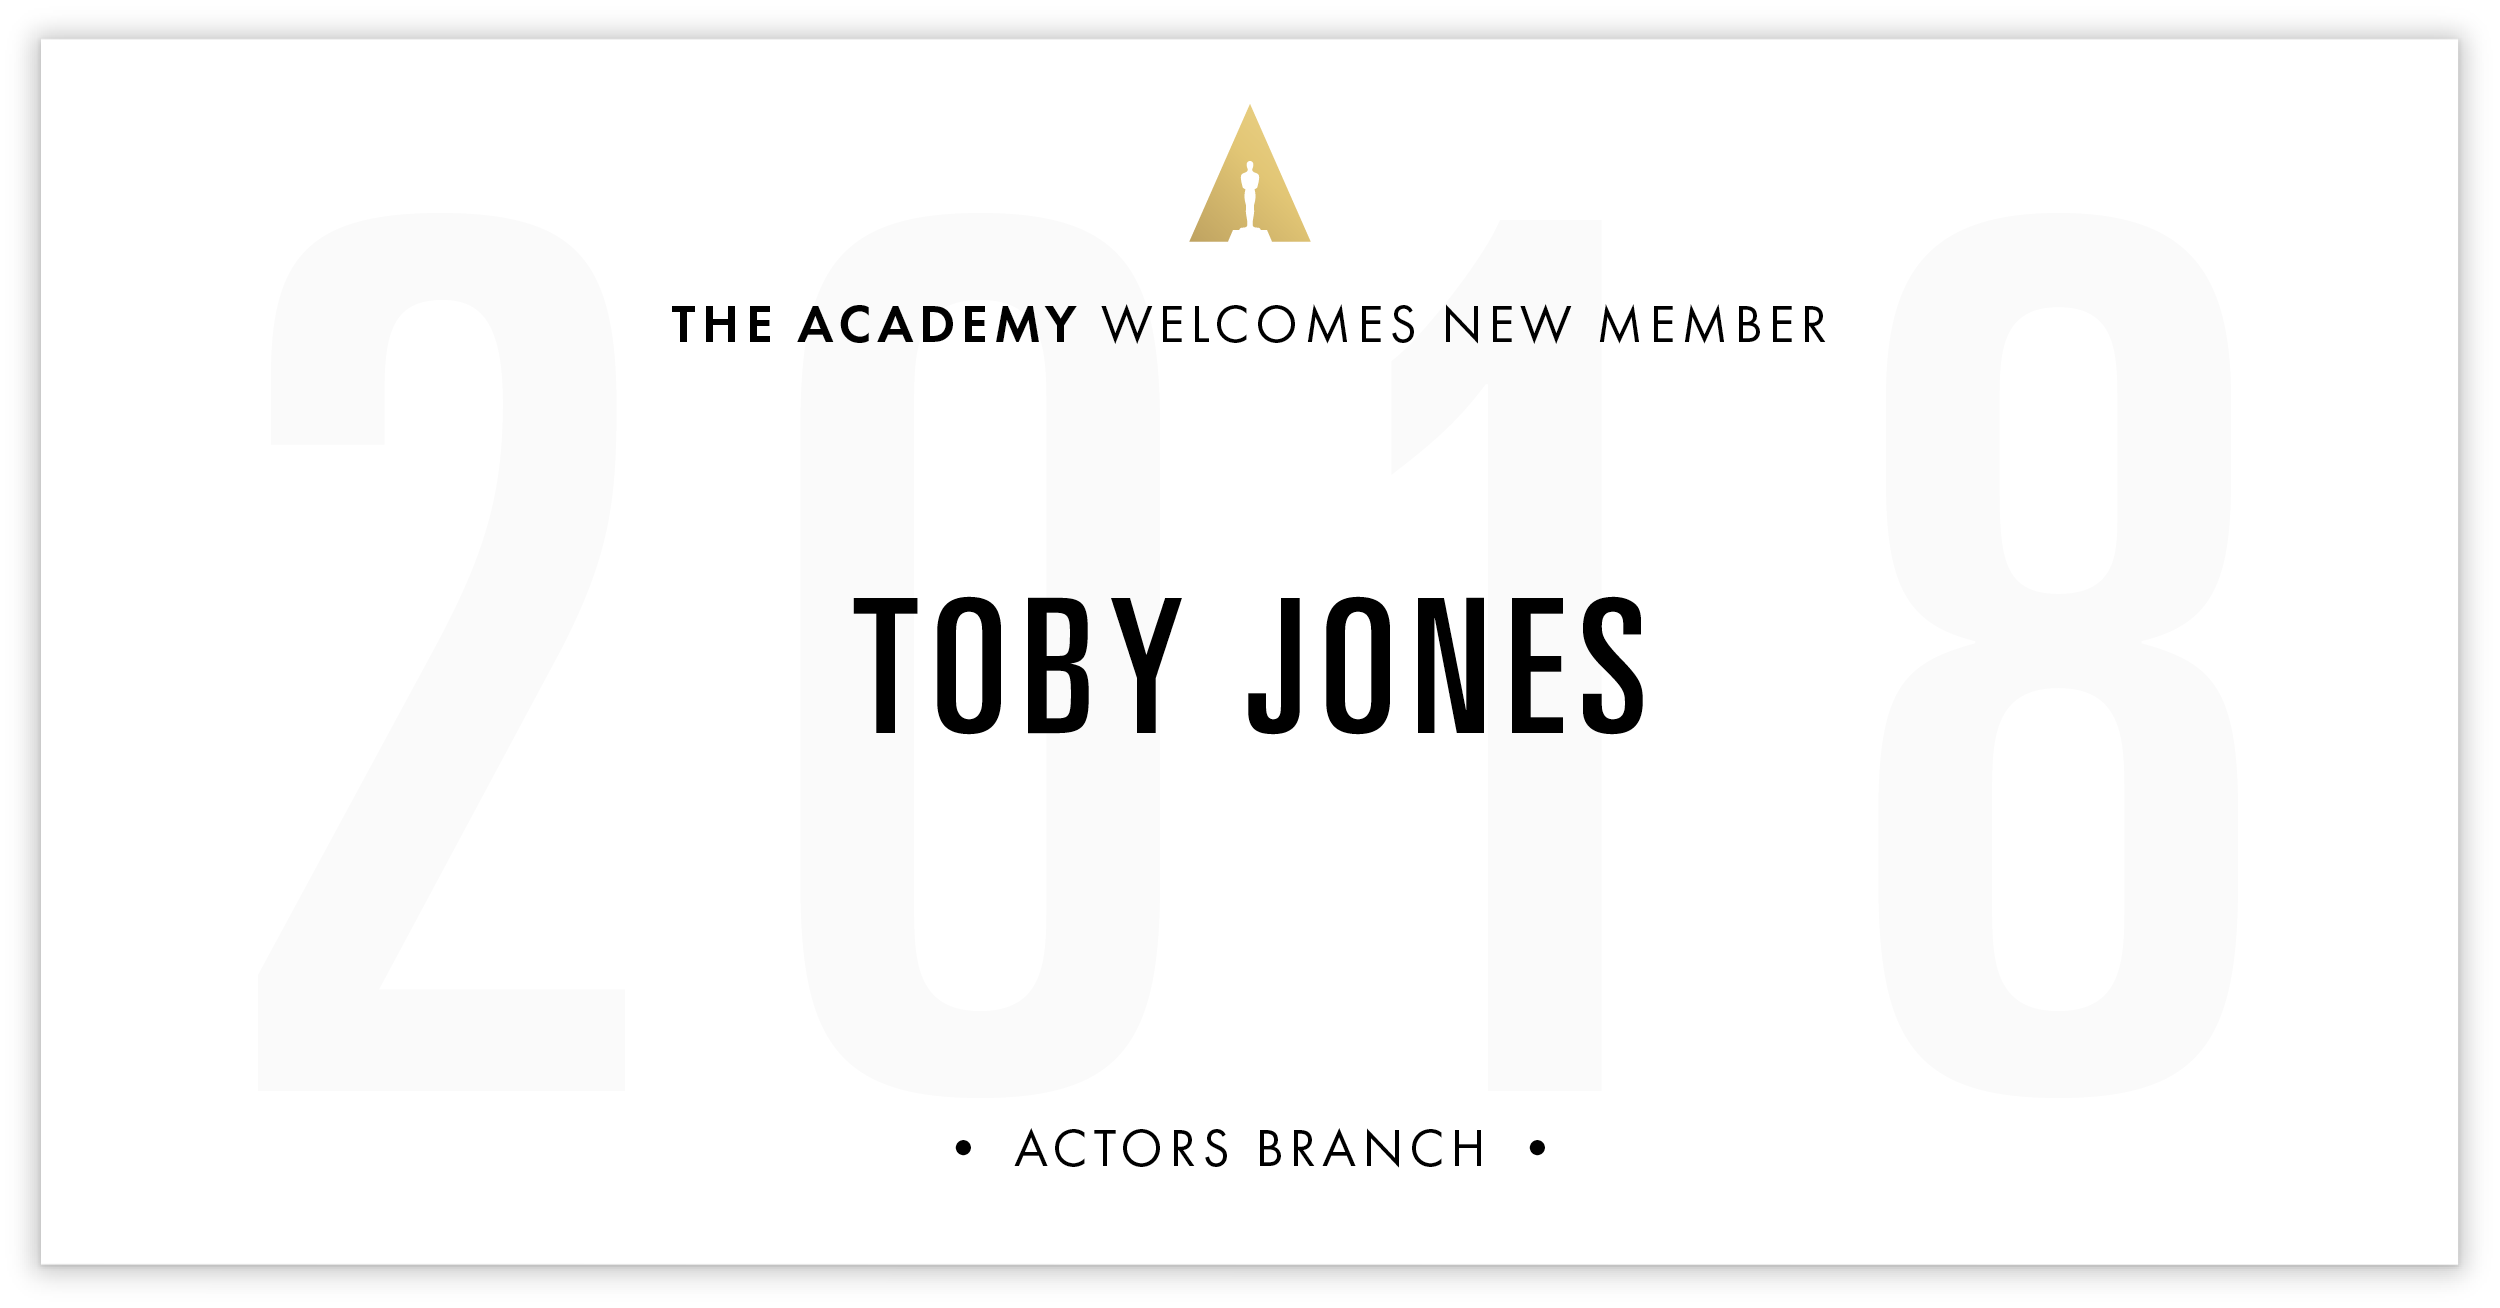 Toby Jones is invited!